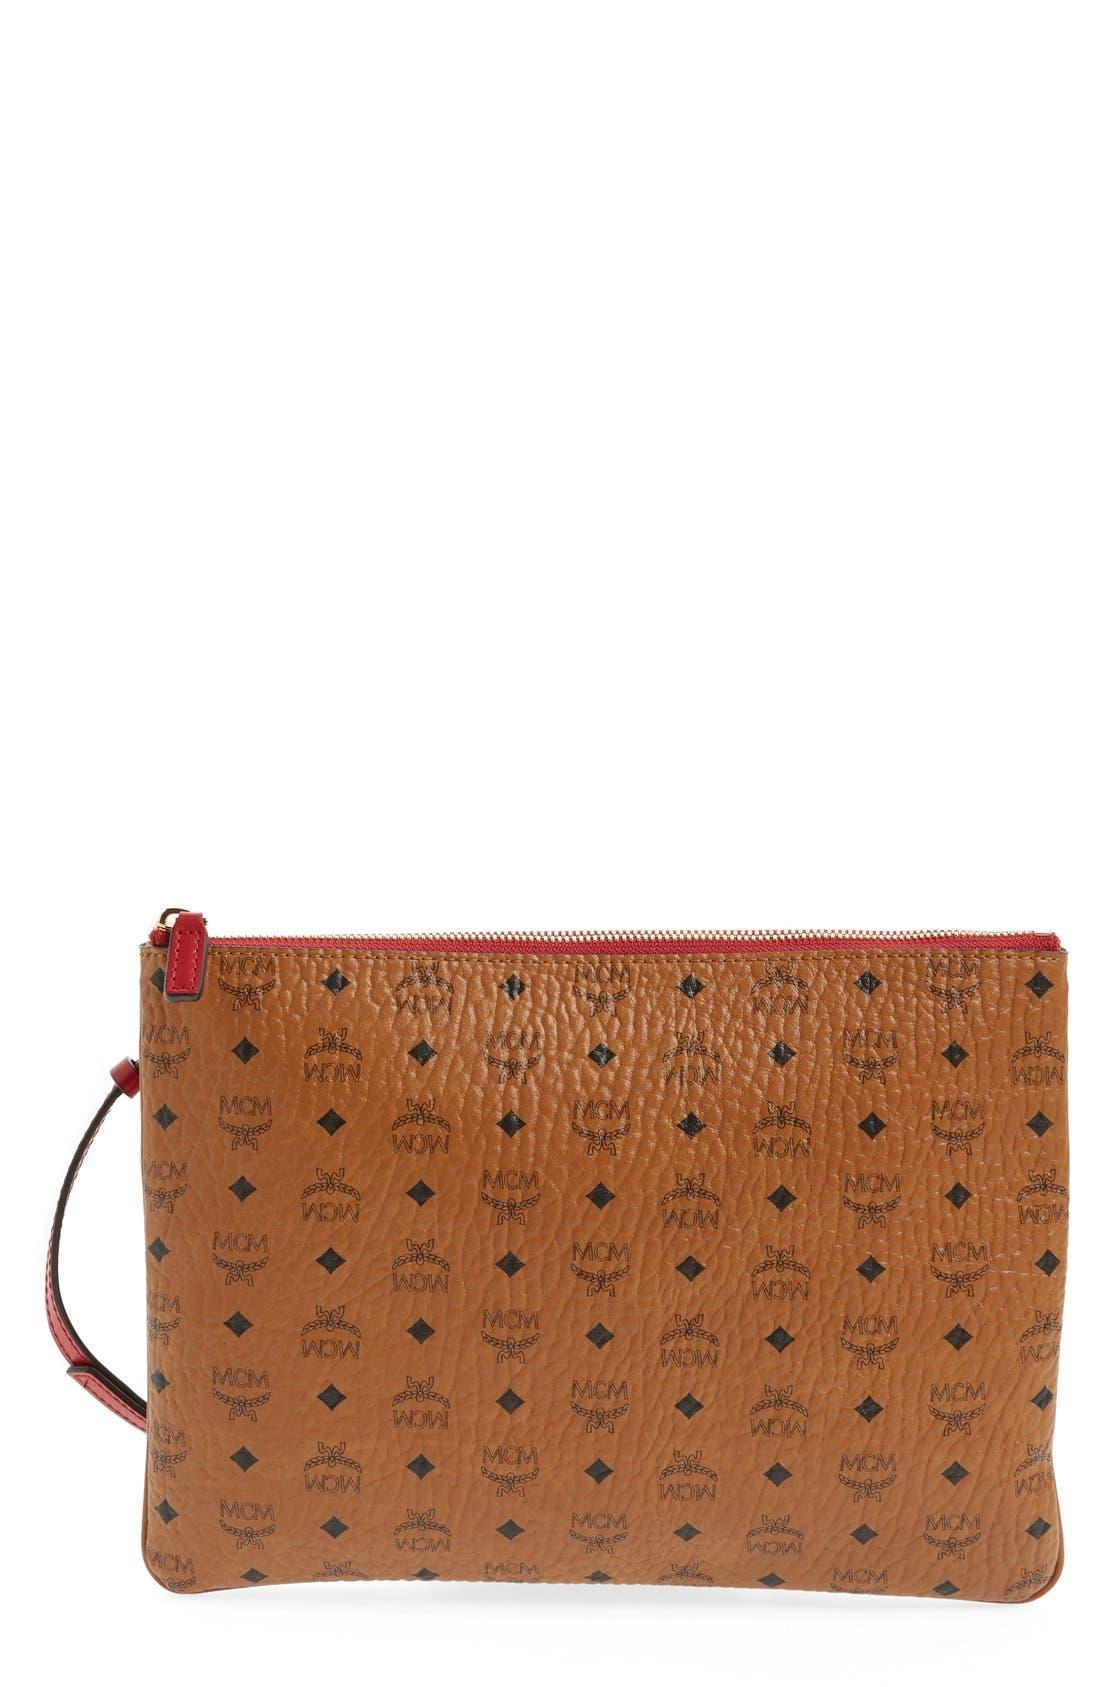 Heritage Convertible Coated Canvas Zip Pouch,                             Main thumbnail 1, color,                             Cognac